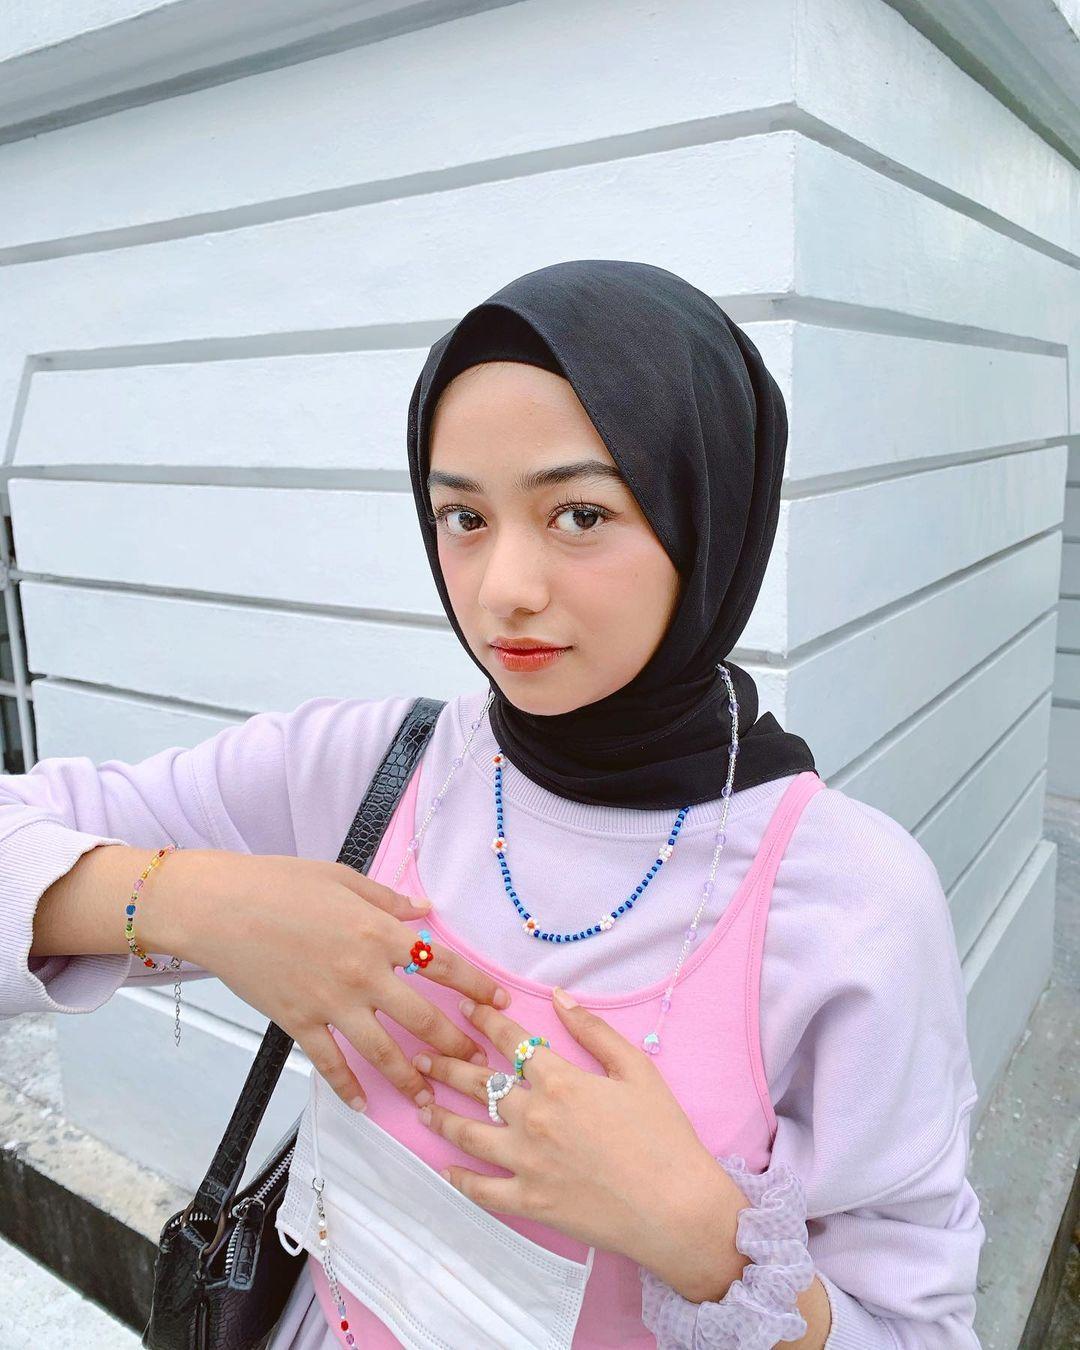 Model Kalung yang Cocok Dipakai untuk Perempuan Berhijab